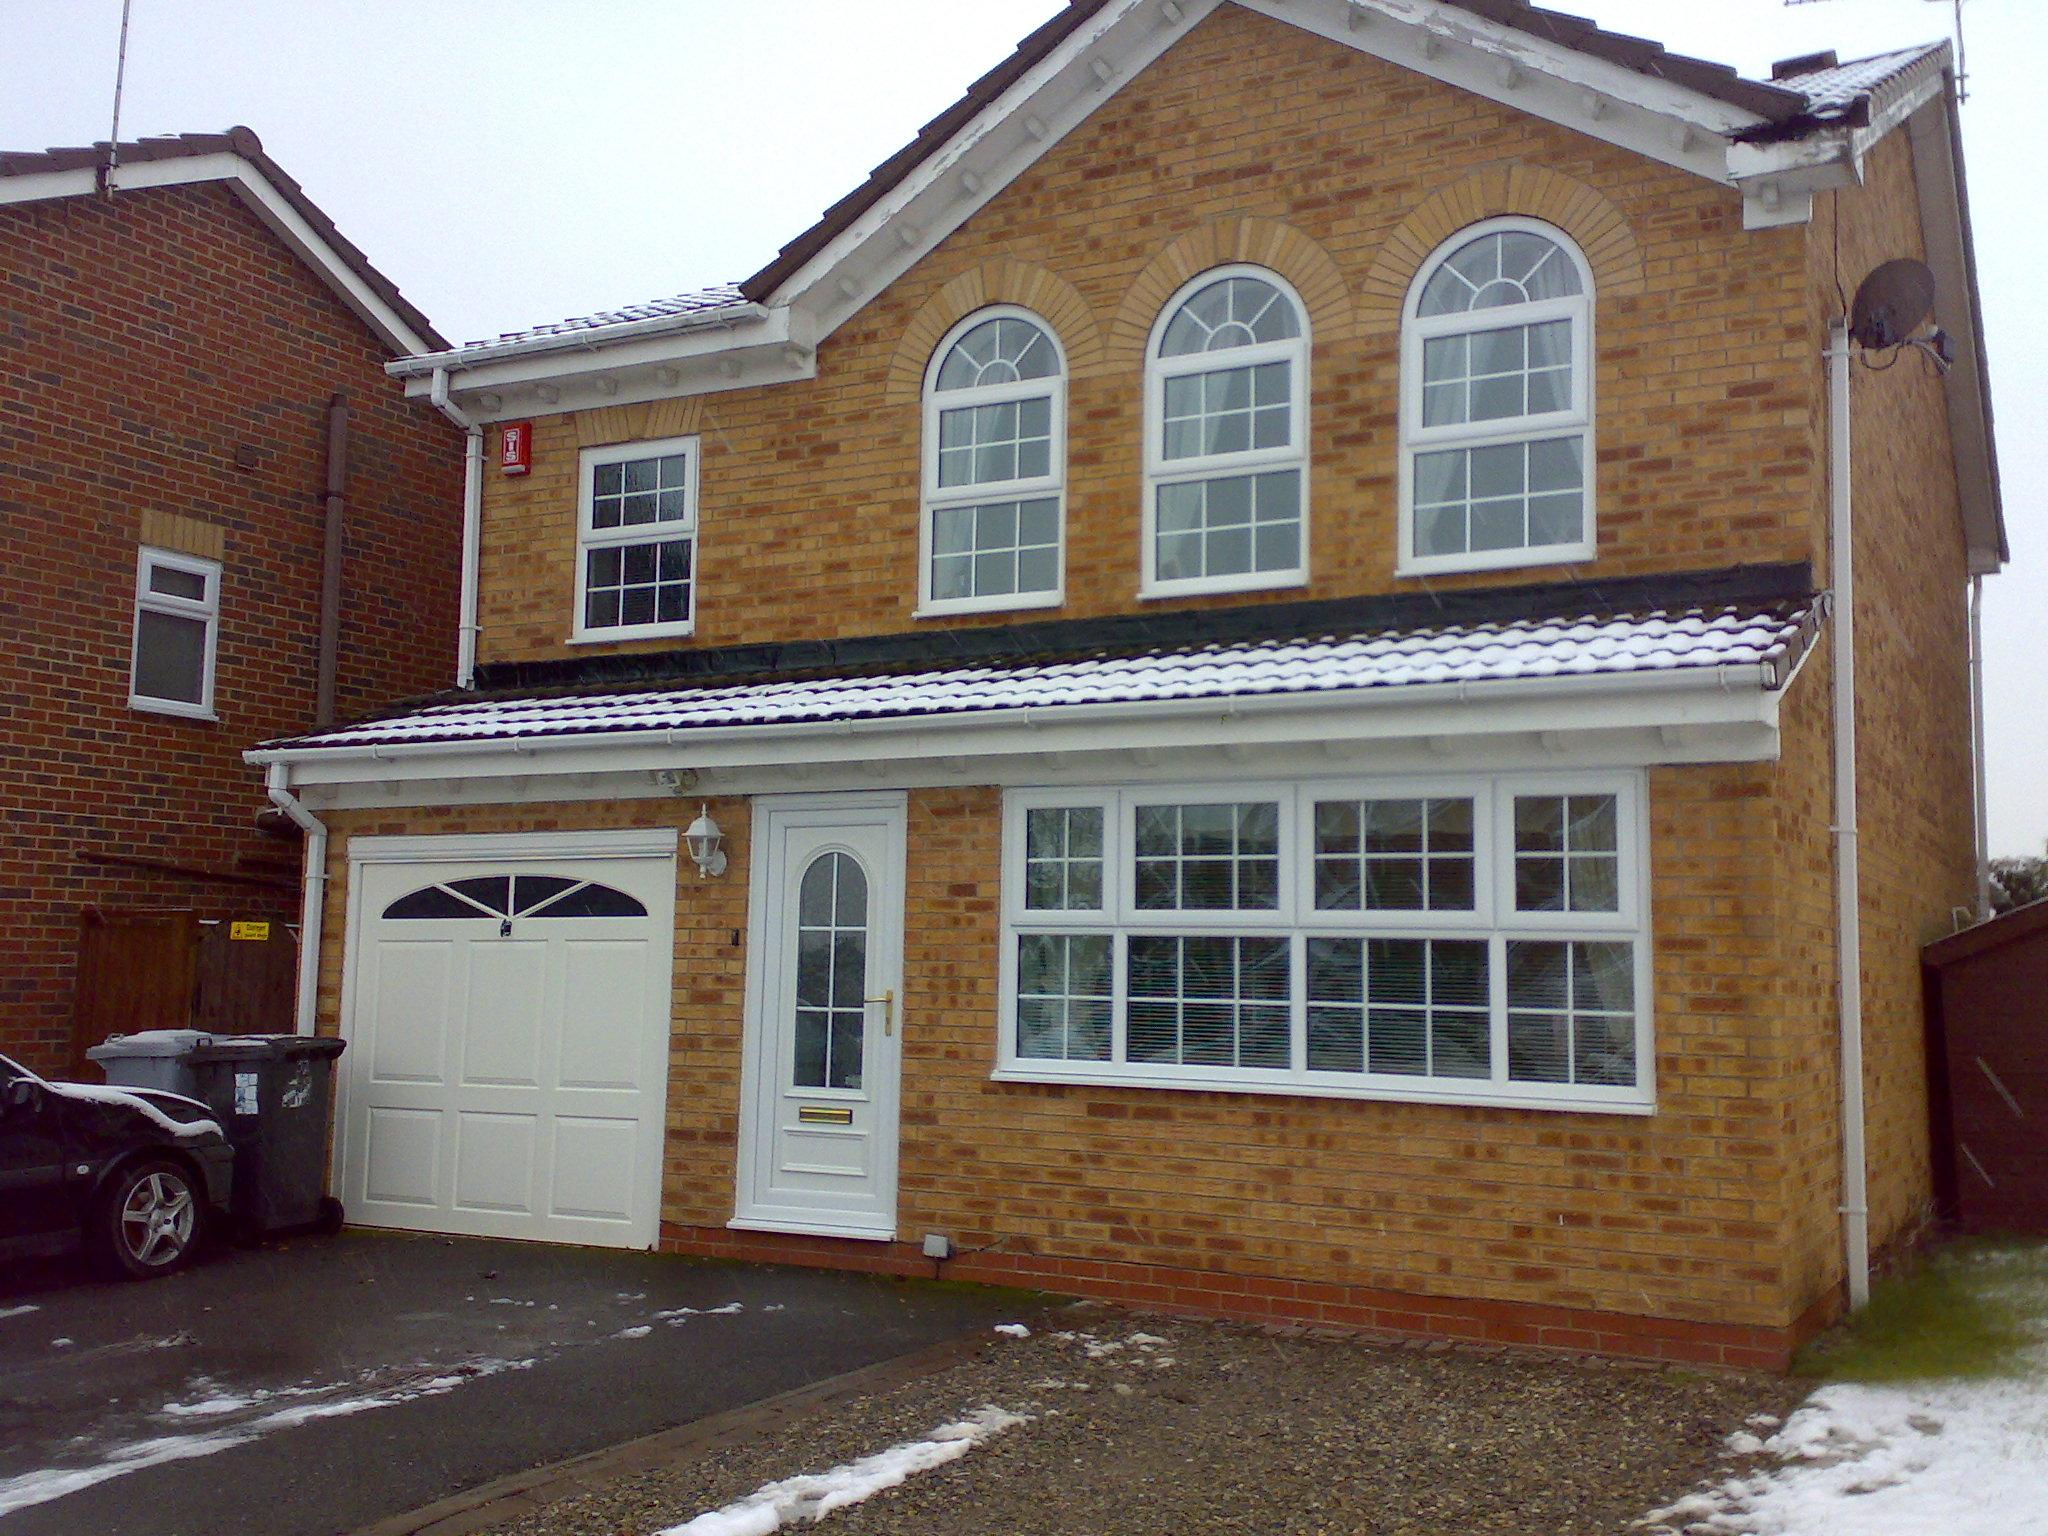 We ... & Windows and Doors | Acon Construction Ltd Wallasey builders company ...